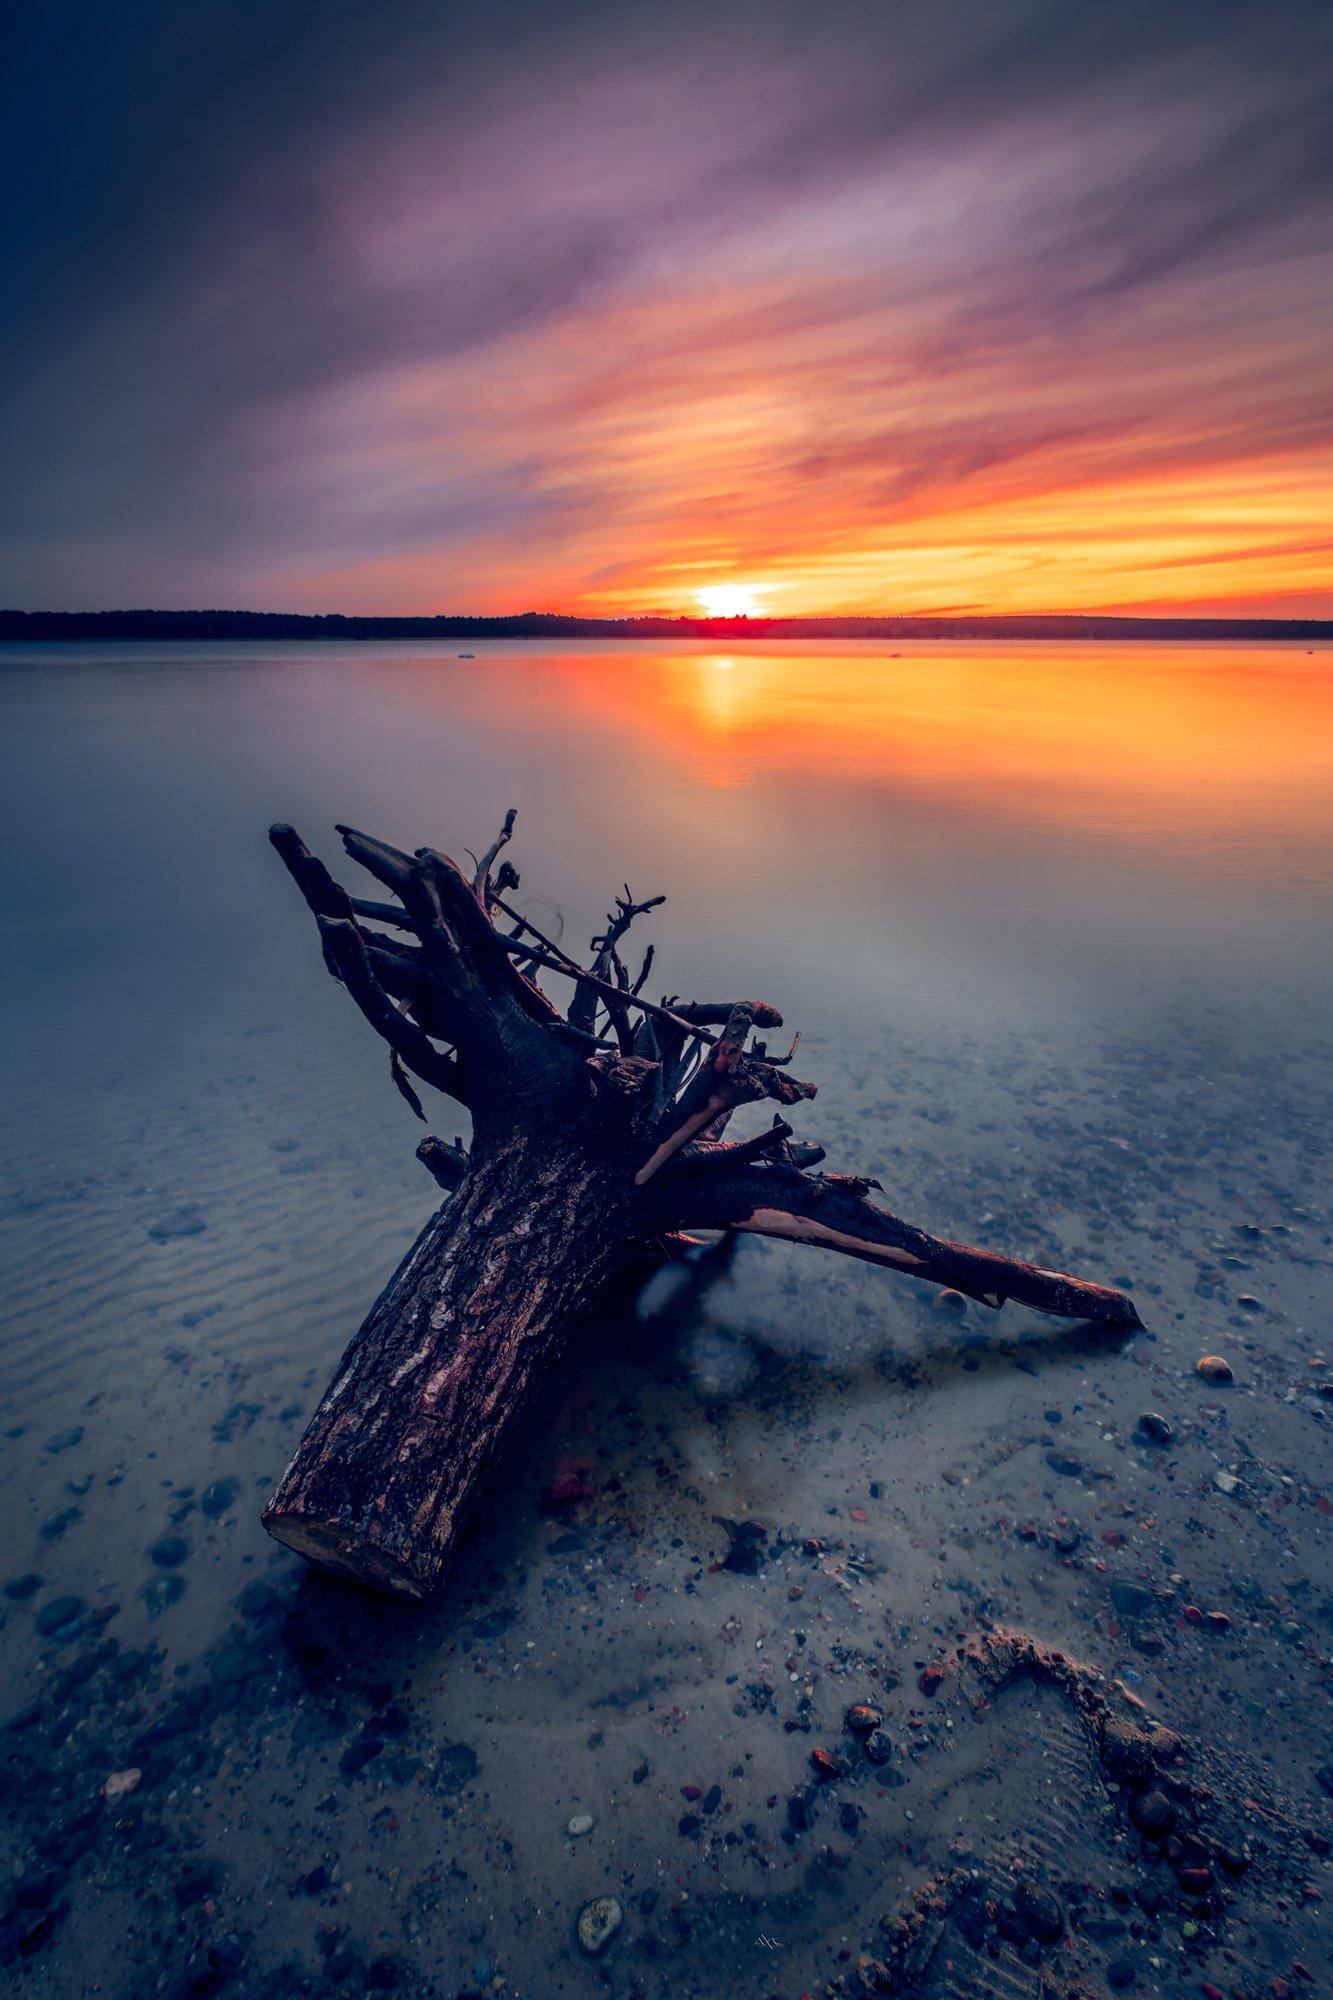 sunset, curonian gulf, colors, long exposure, landscape, Руслан Болгов (Axe)